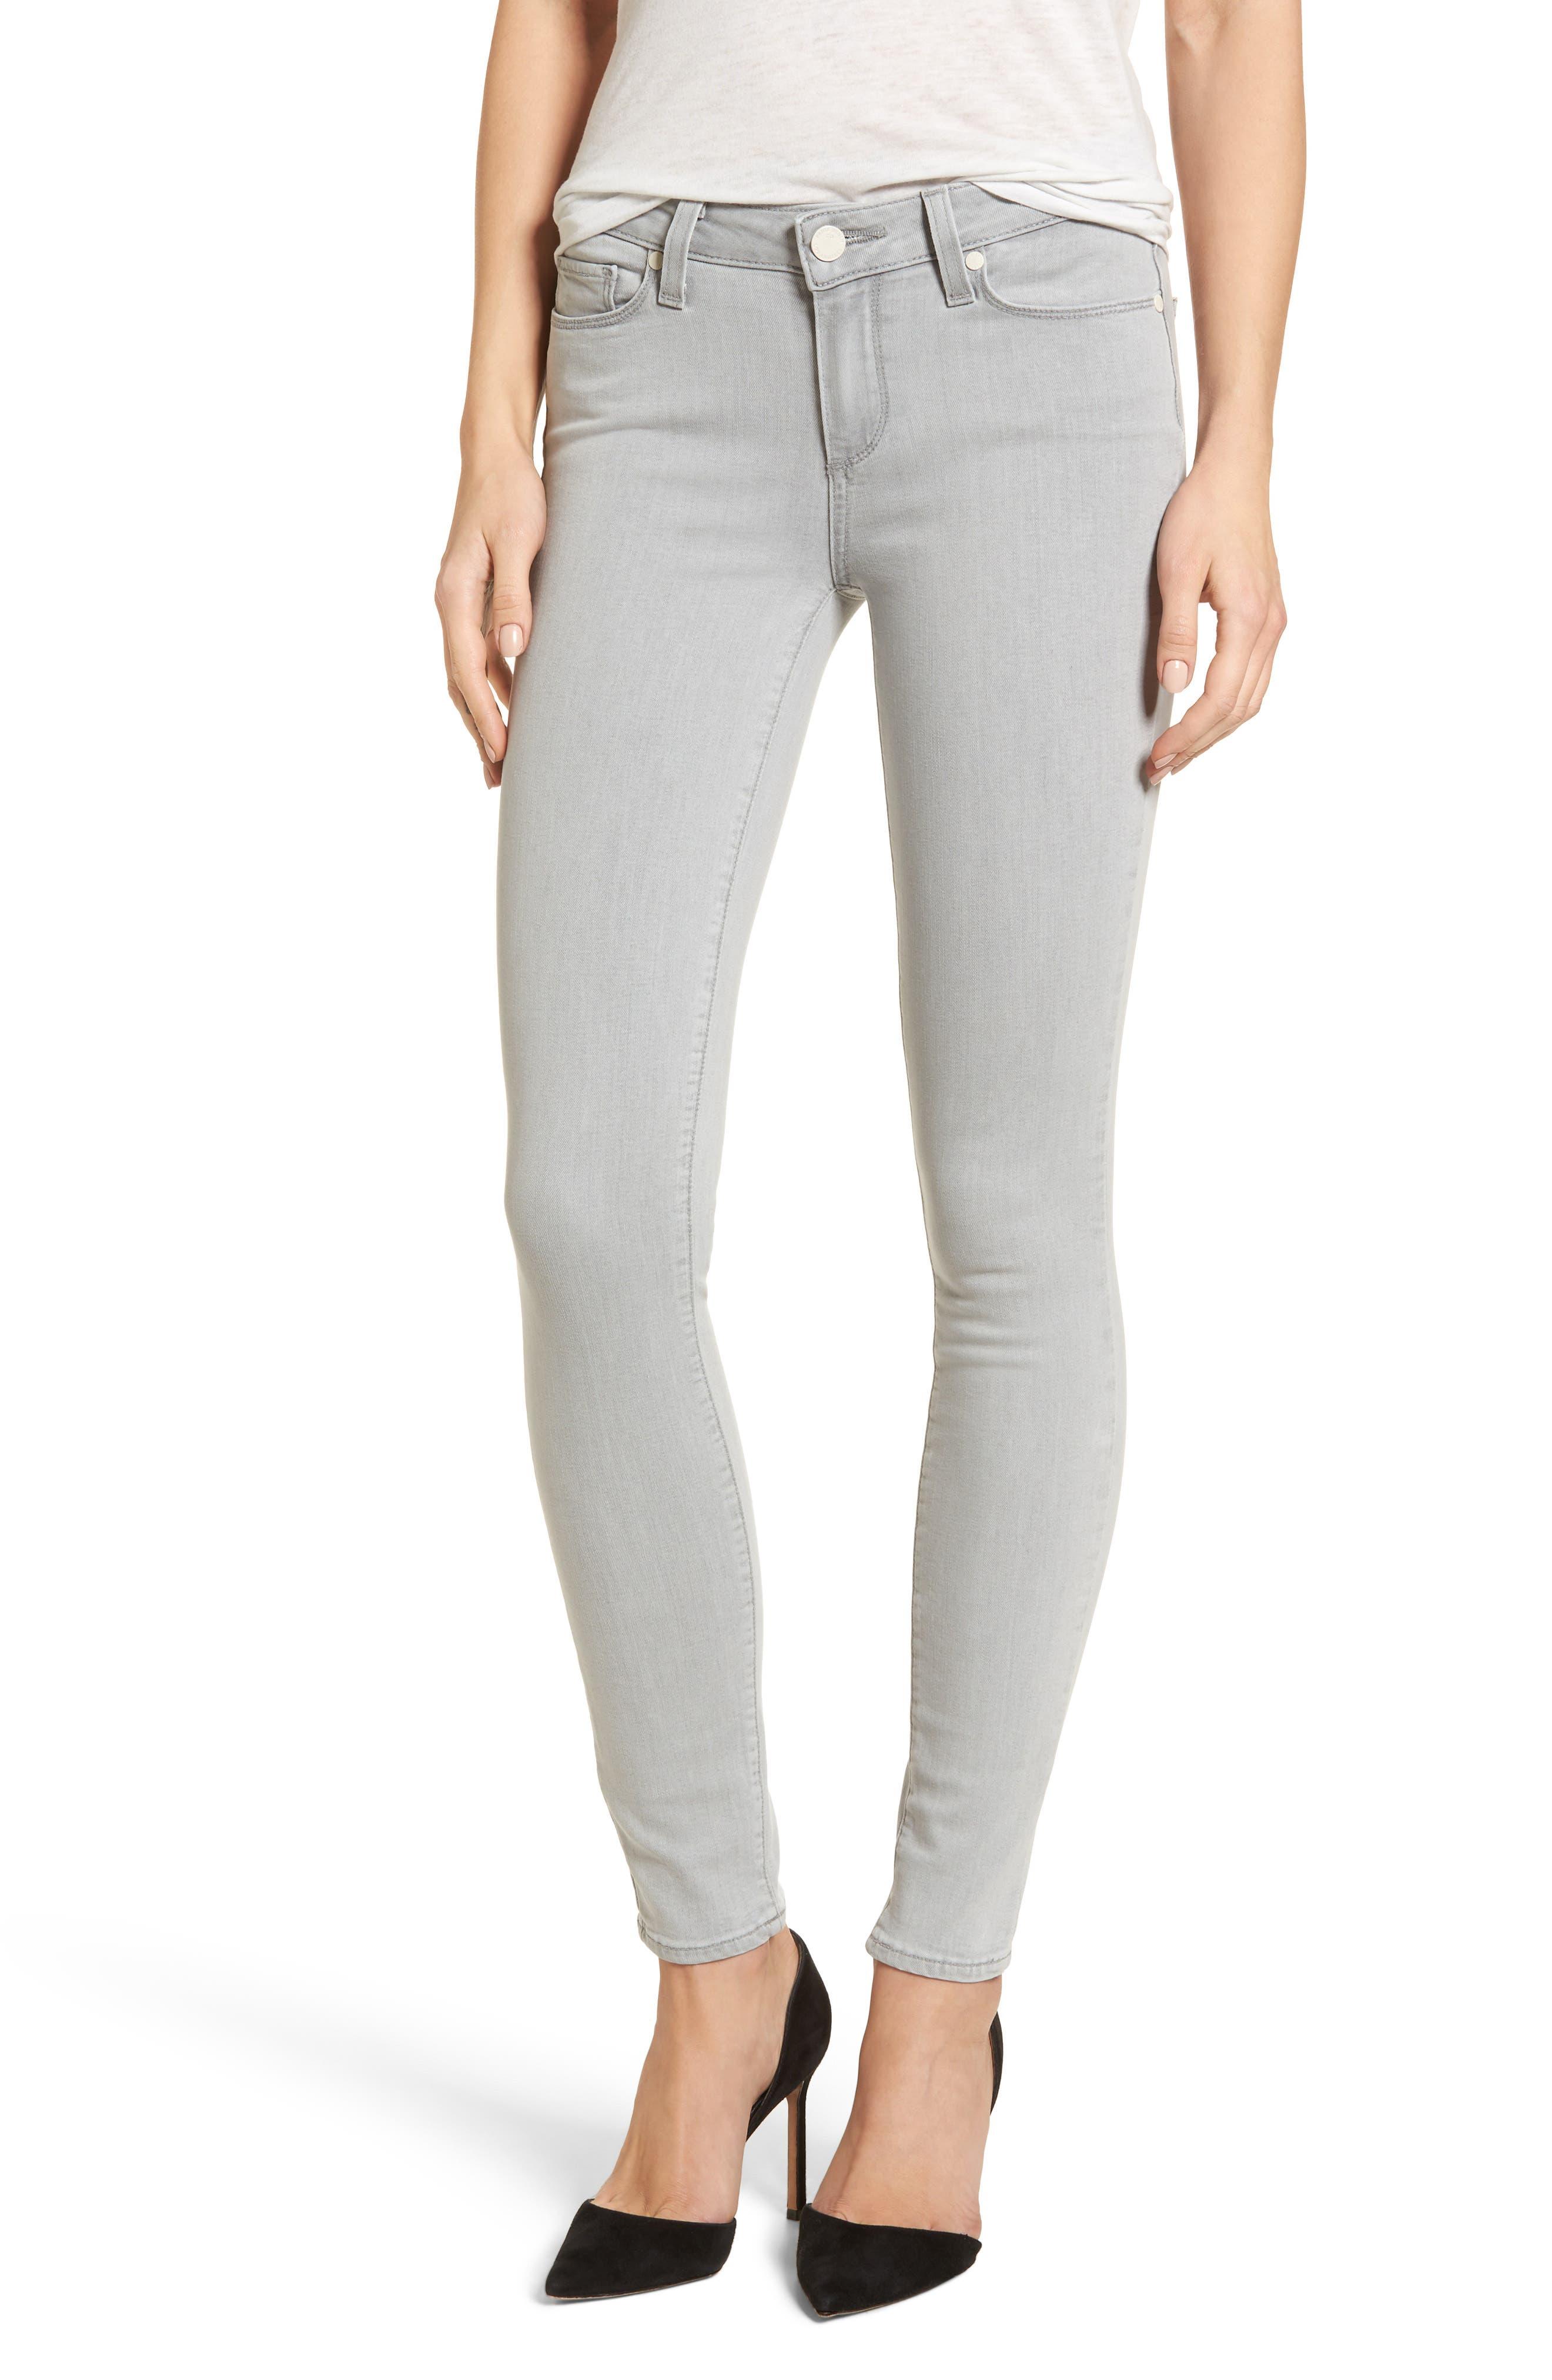 Transcend - Verdugo Ultra Skinny Jeans,                             Main thumbnail 1, color,                             Whisper Grey